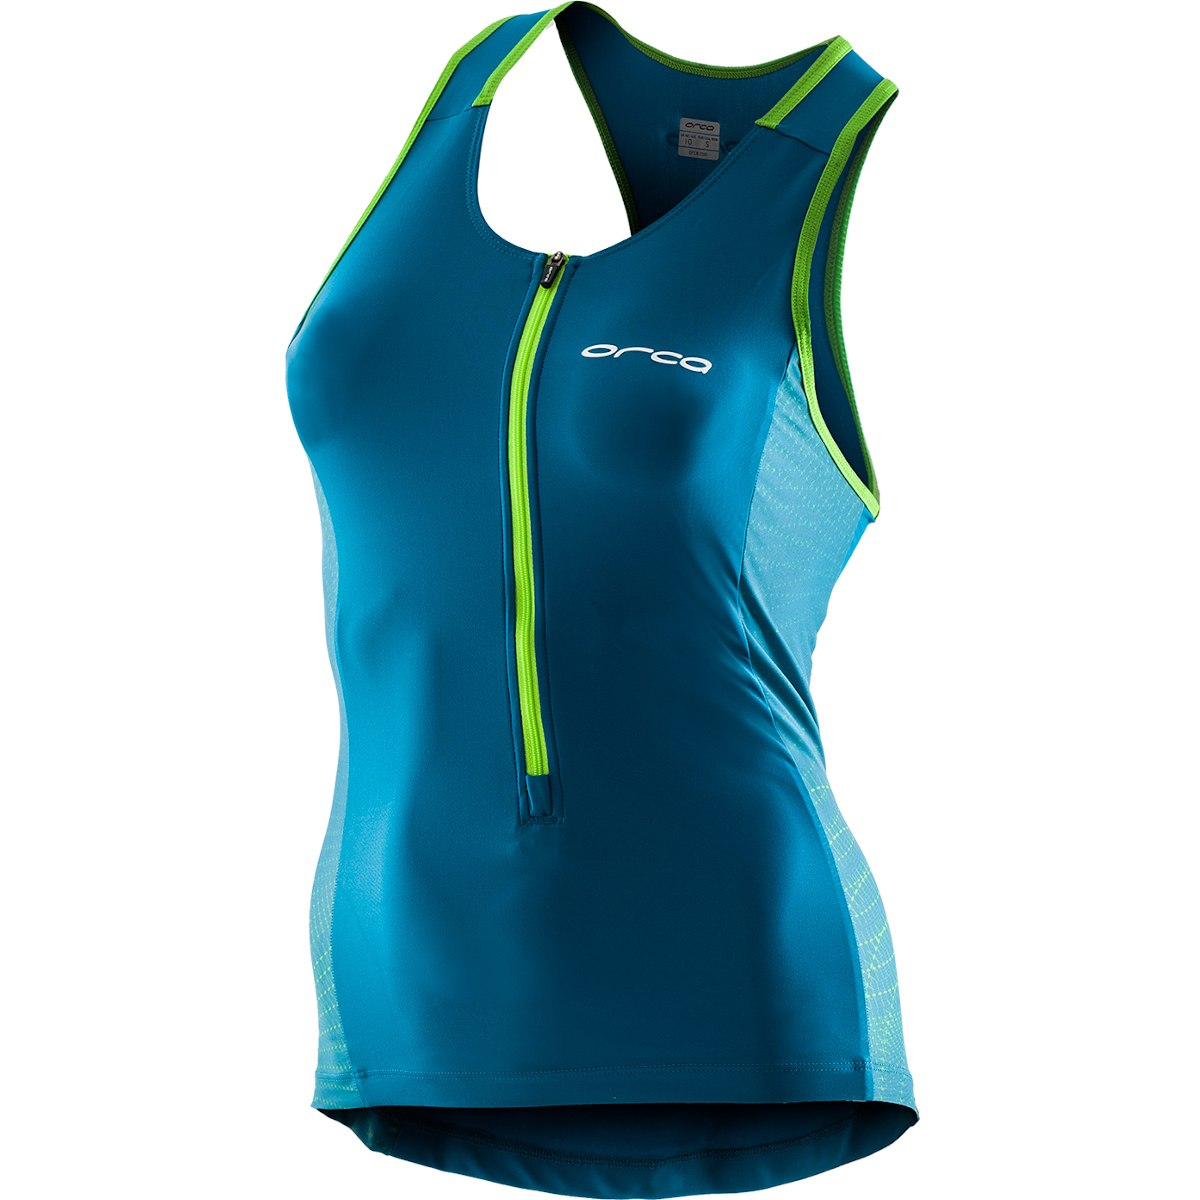 Foto de Orca Core Short Sleeved Tri Top Womens - turquoise